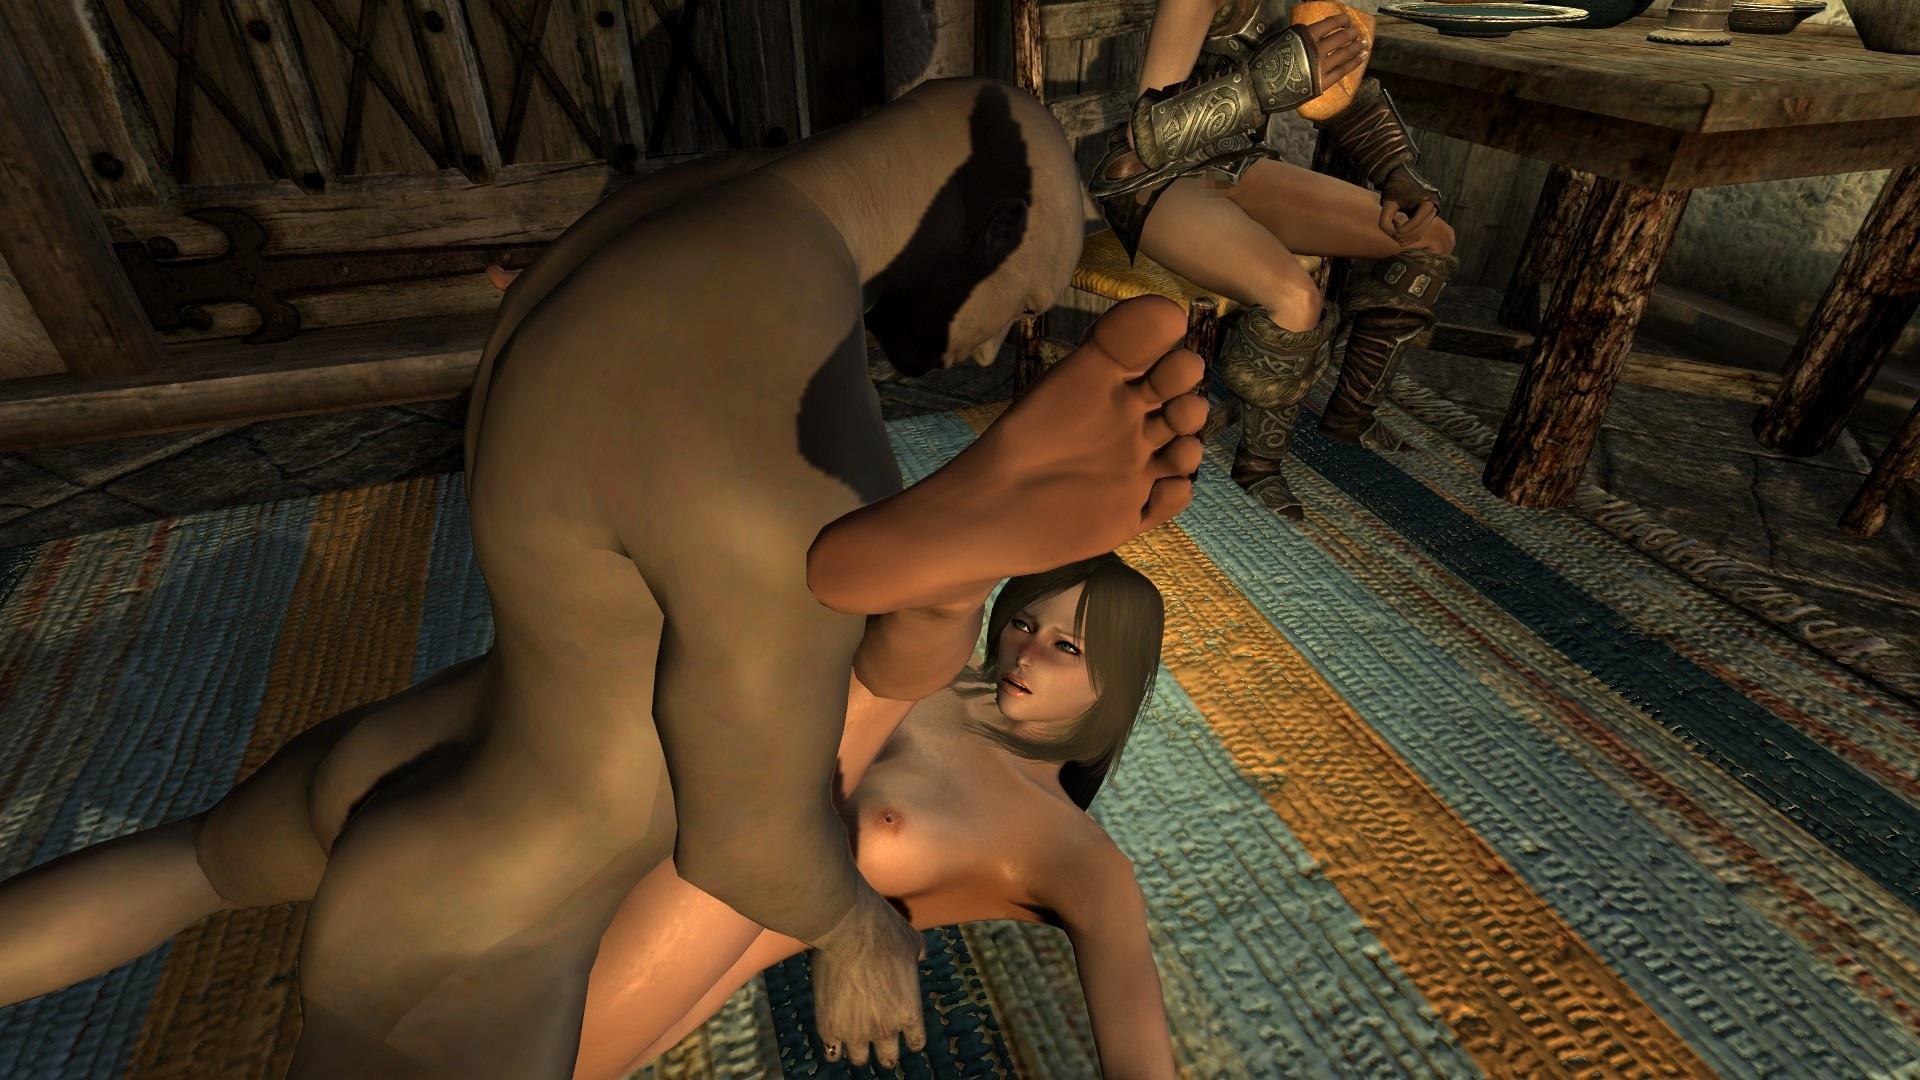 Порно в обливион смотреть онлайн видео фото 633-279